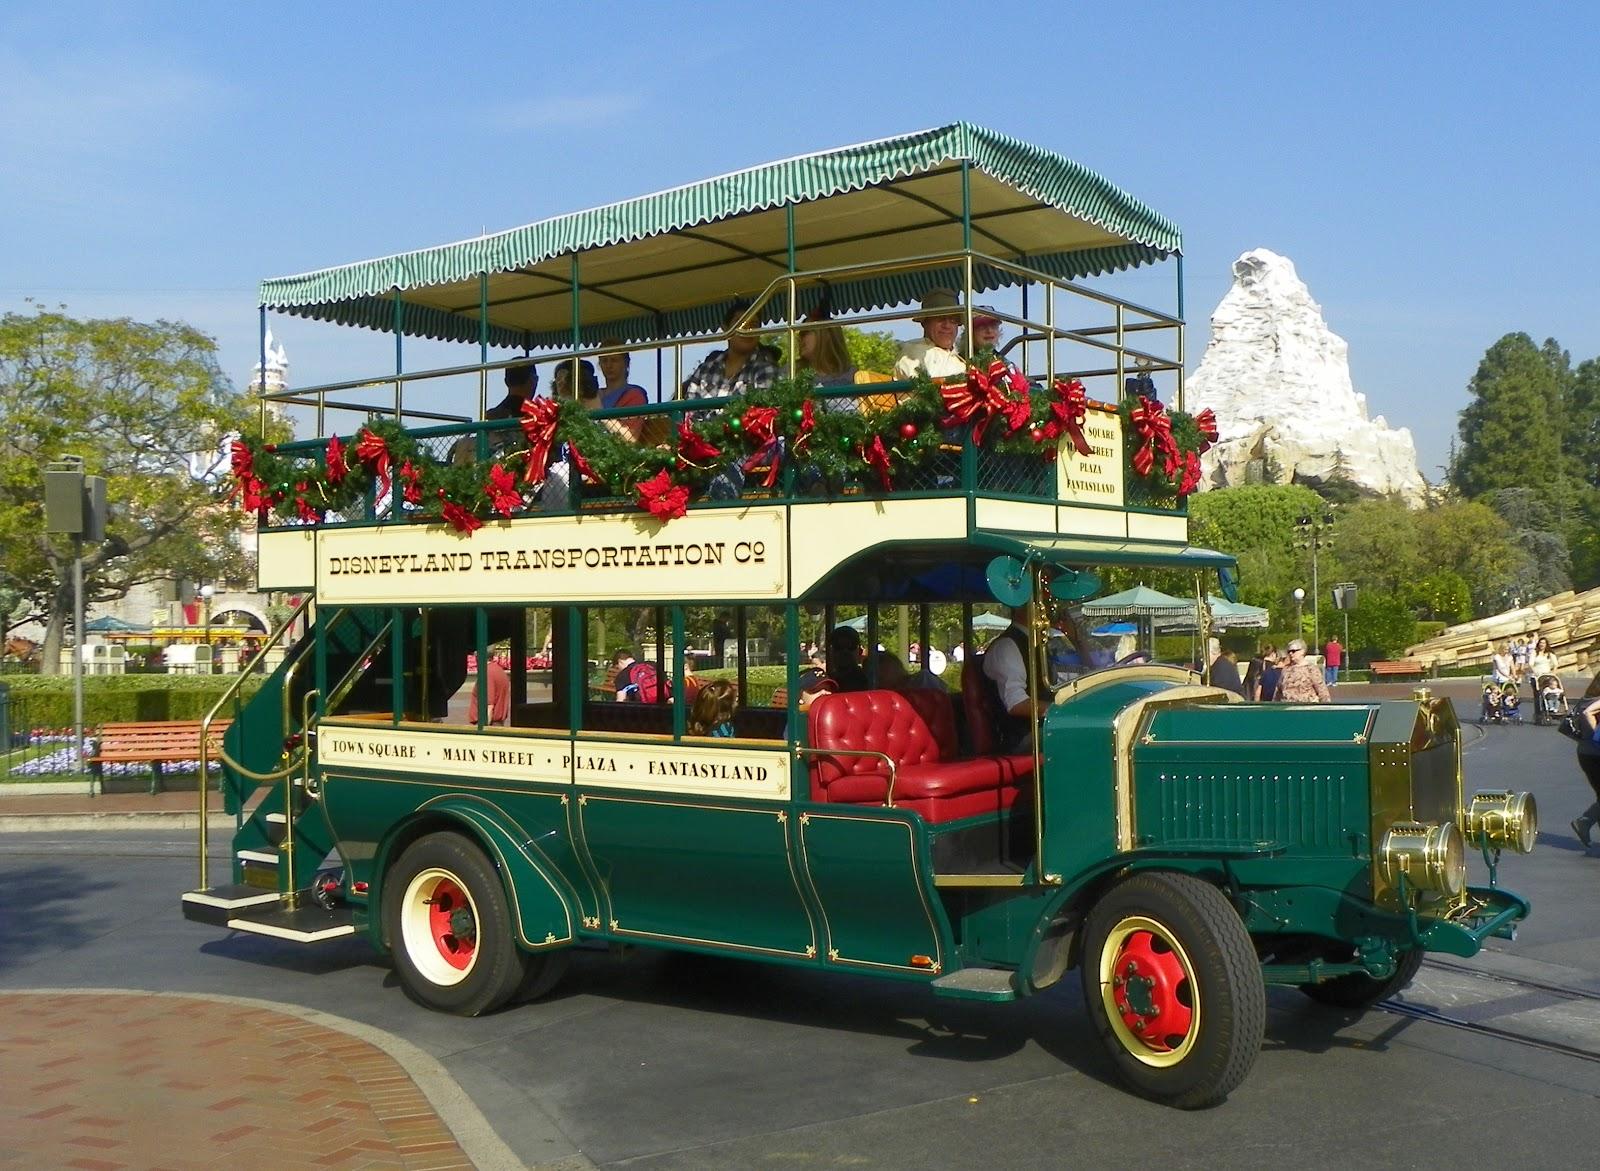 Supply chain management the Disney way